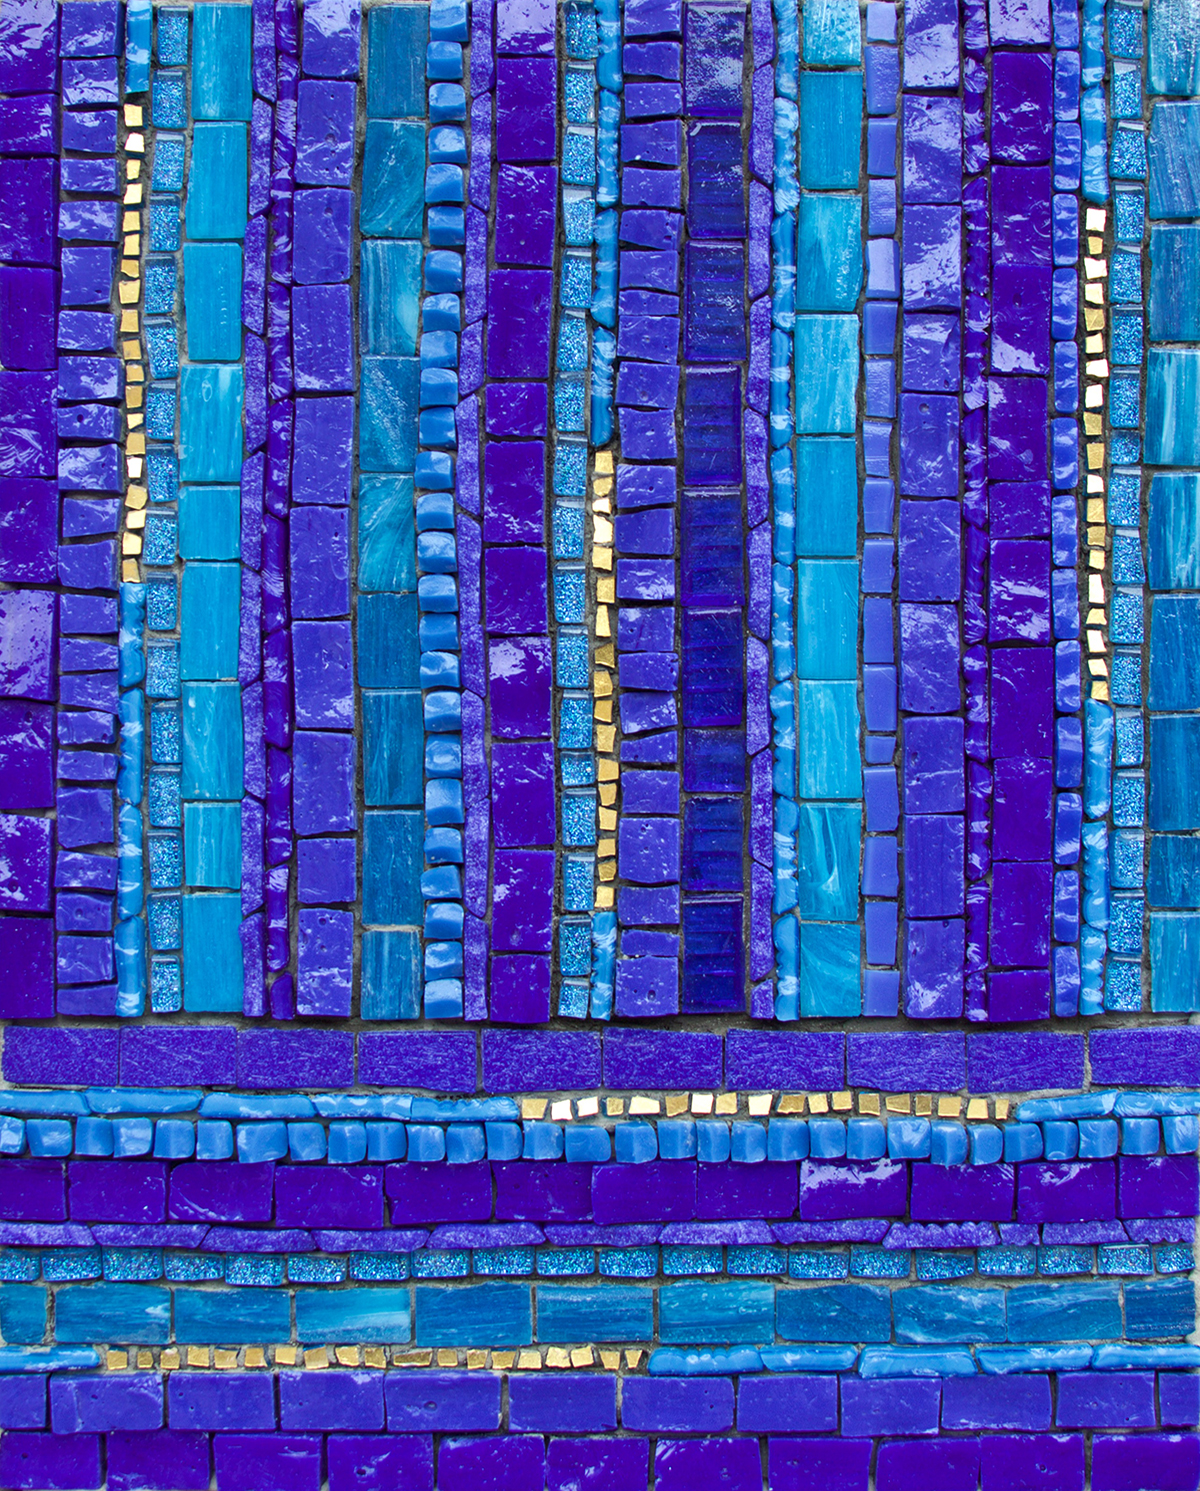 "Beginner's Mind #2  . 10"" x 8"" | 25cm x 20cm. Smalti, vitreous, mosaic gold, other glass"